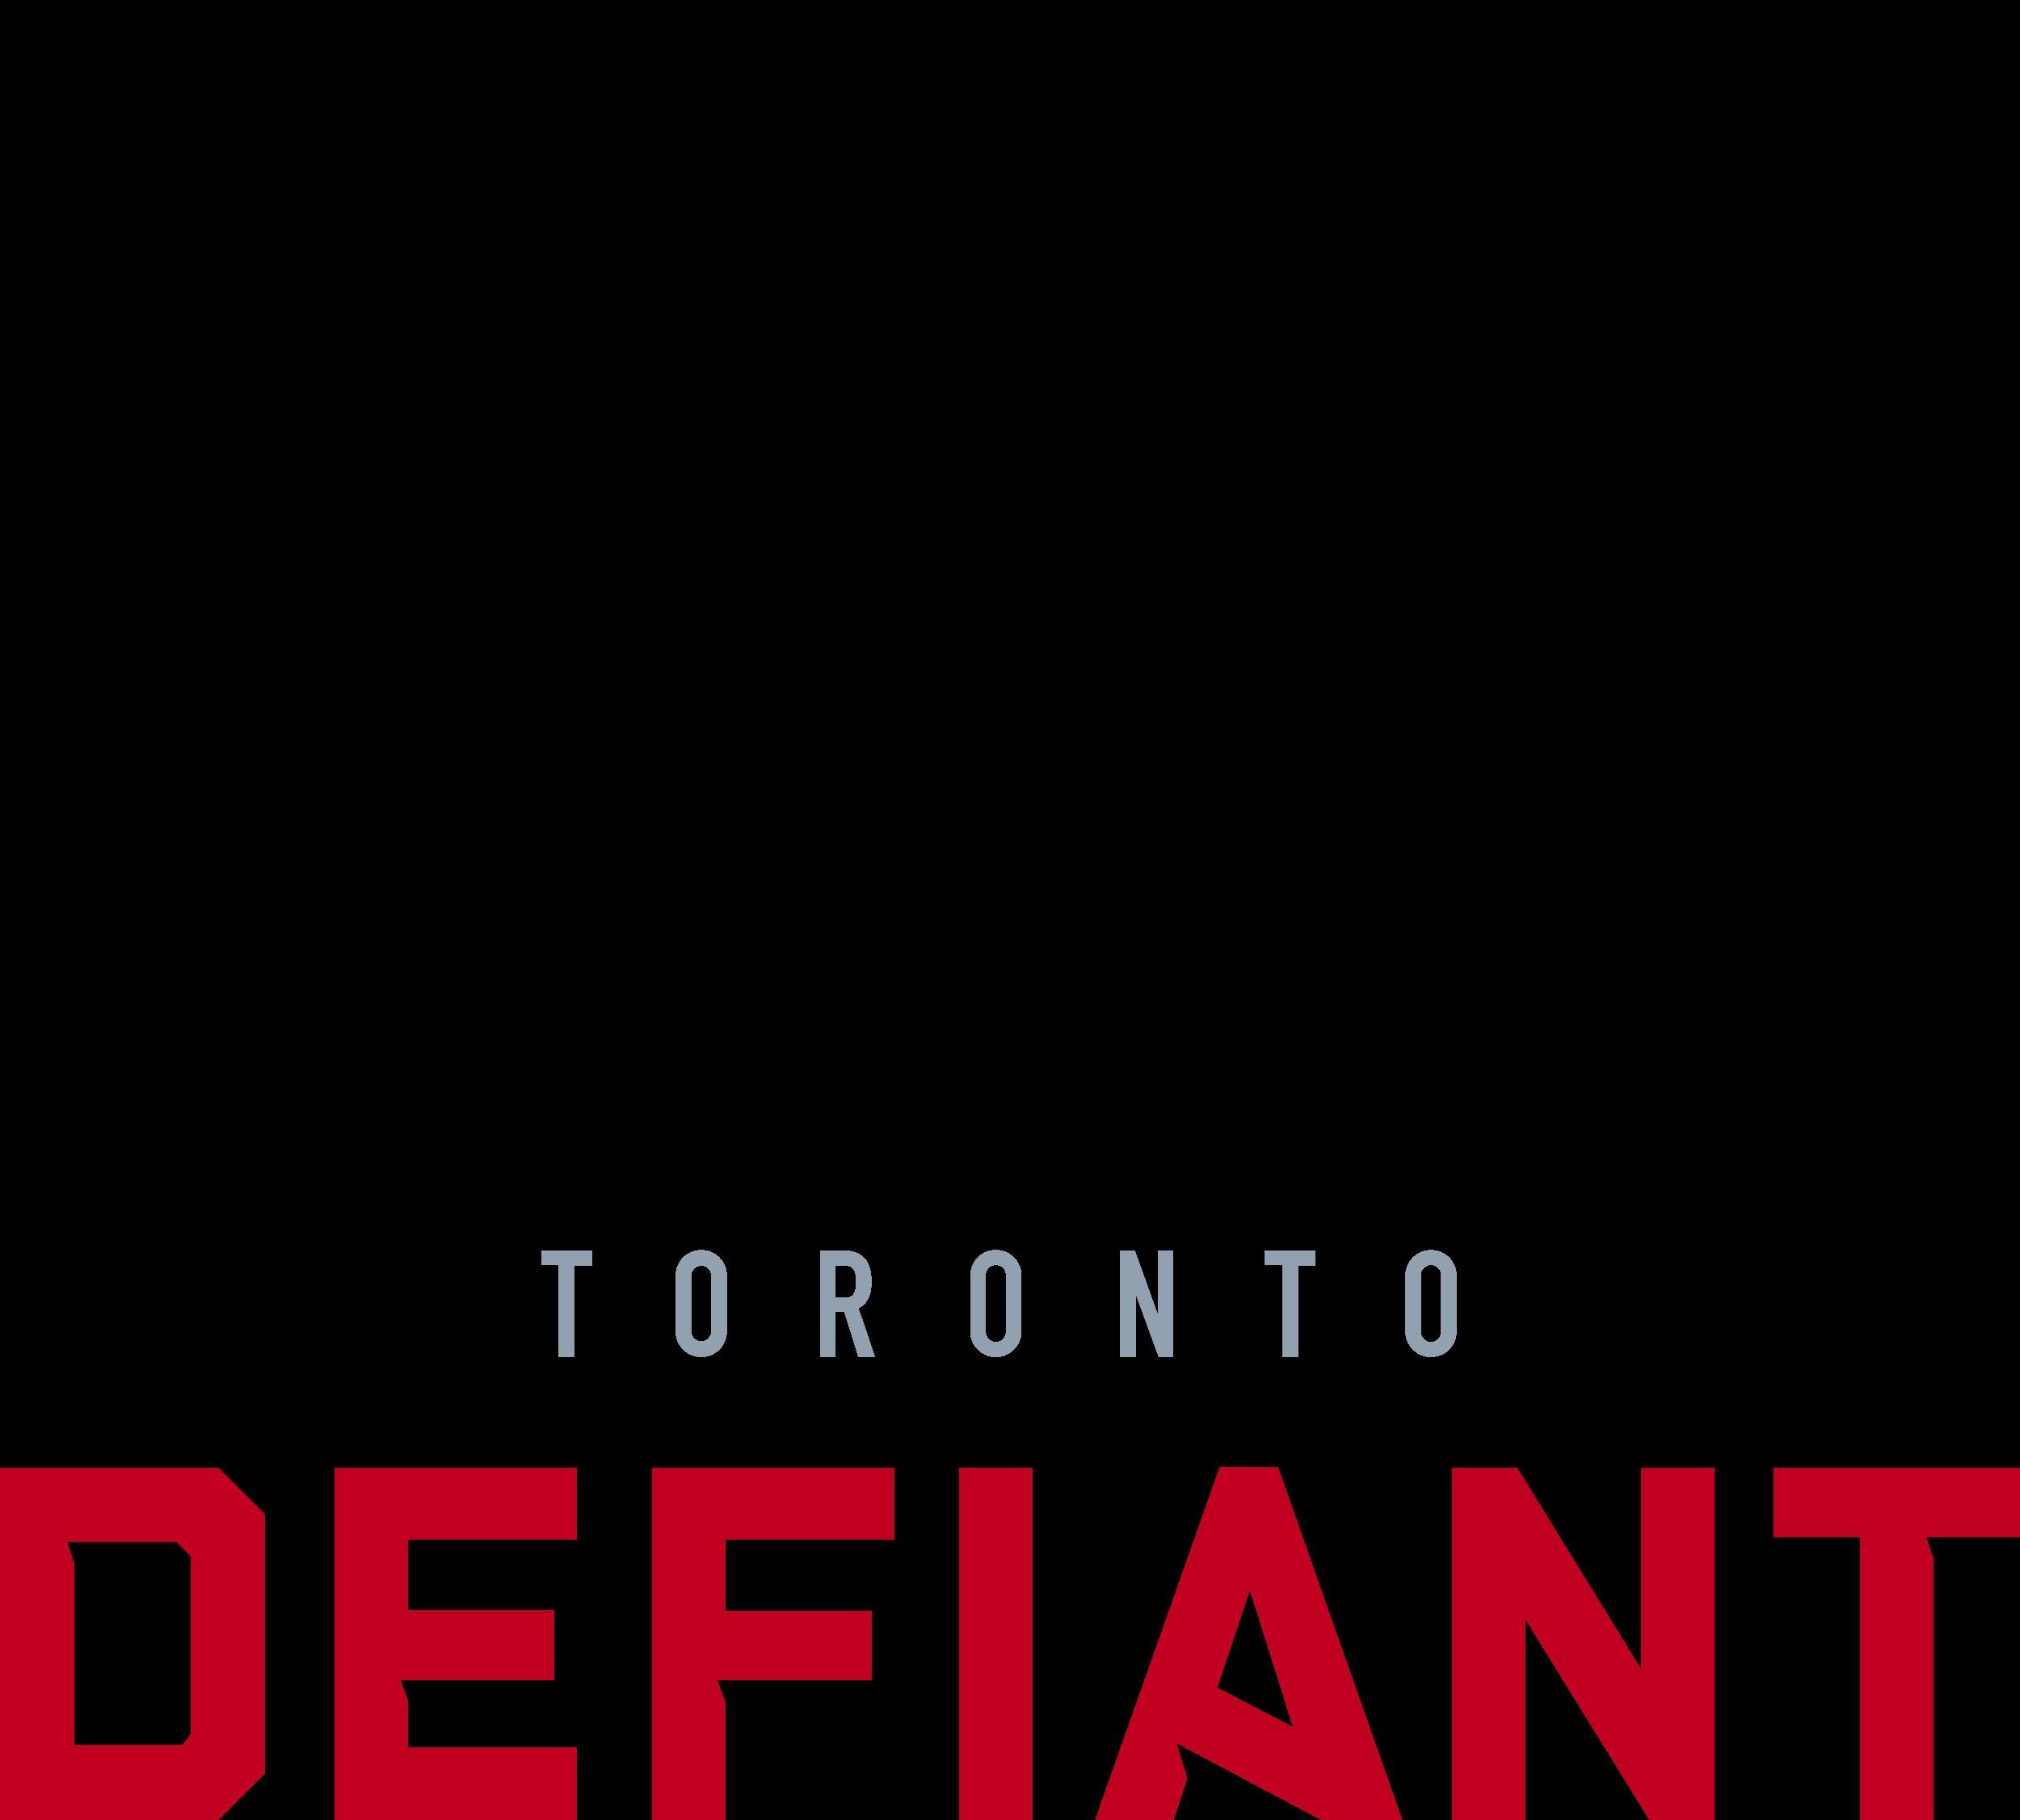 Toronto Defiant Overwatch Team Logo